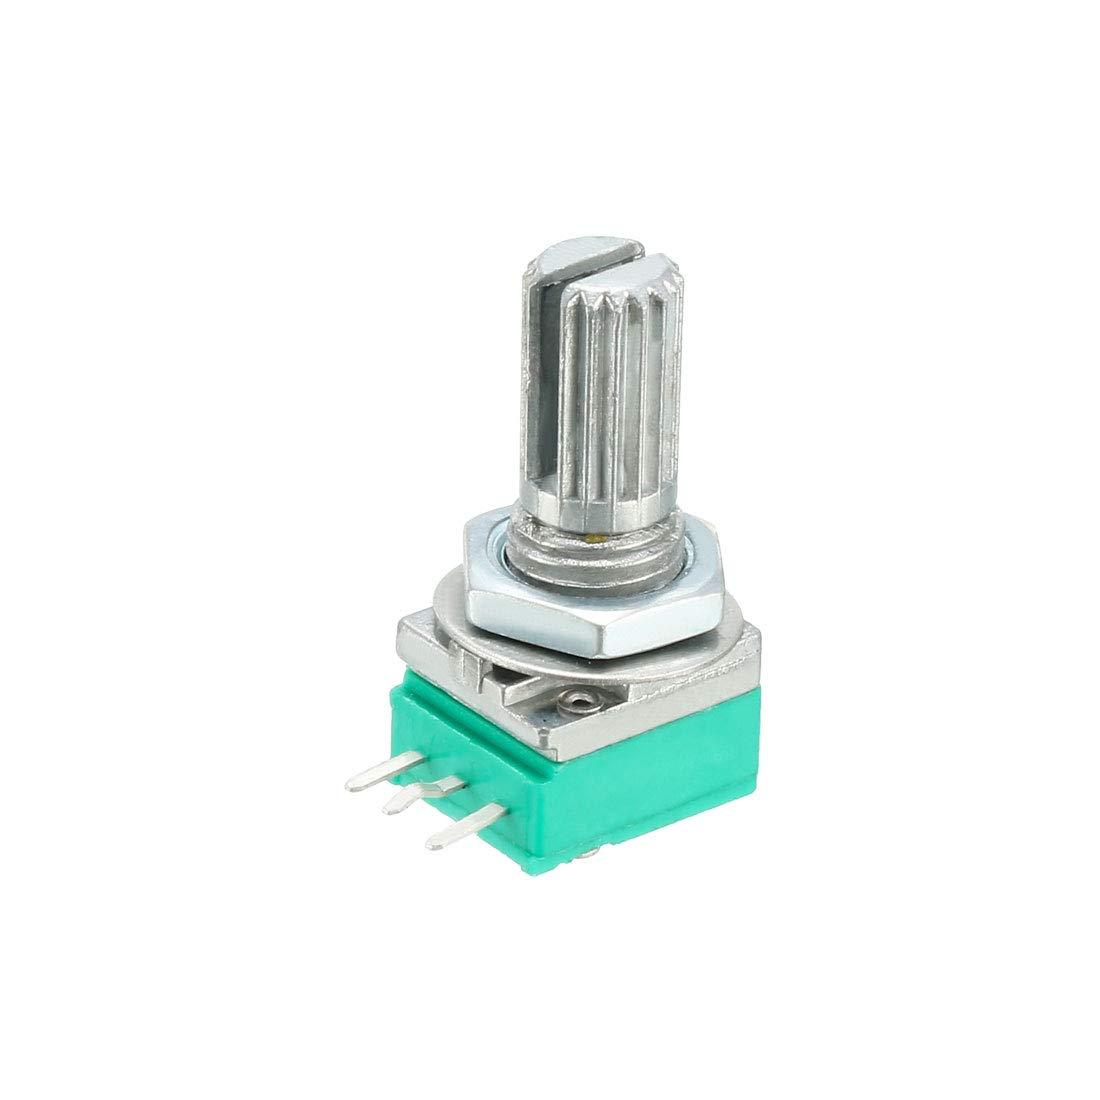 uxcell RK097N 50K Ohm Variable Resistors Single Turn Rotary Carbon Film Taper Potentiometer